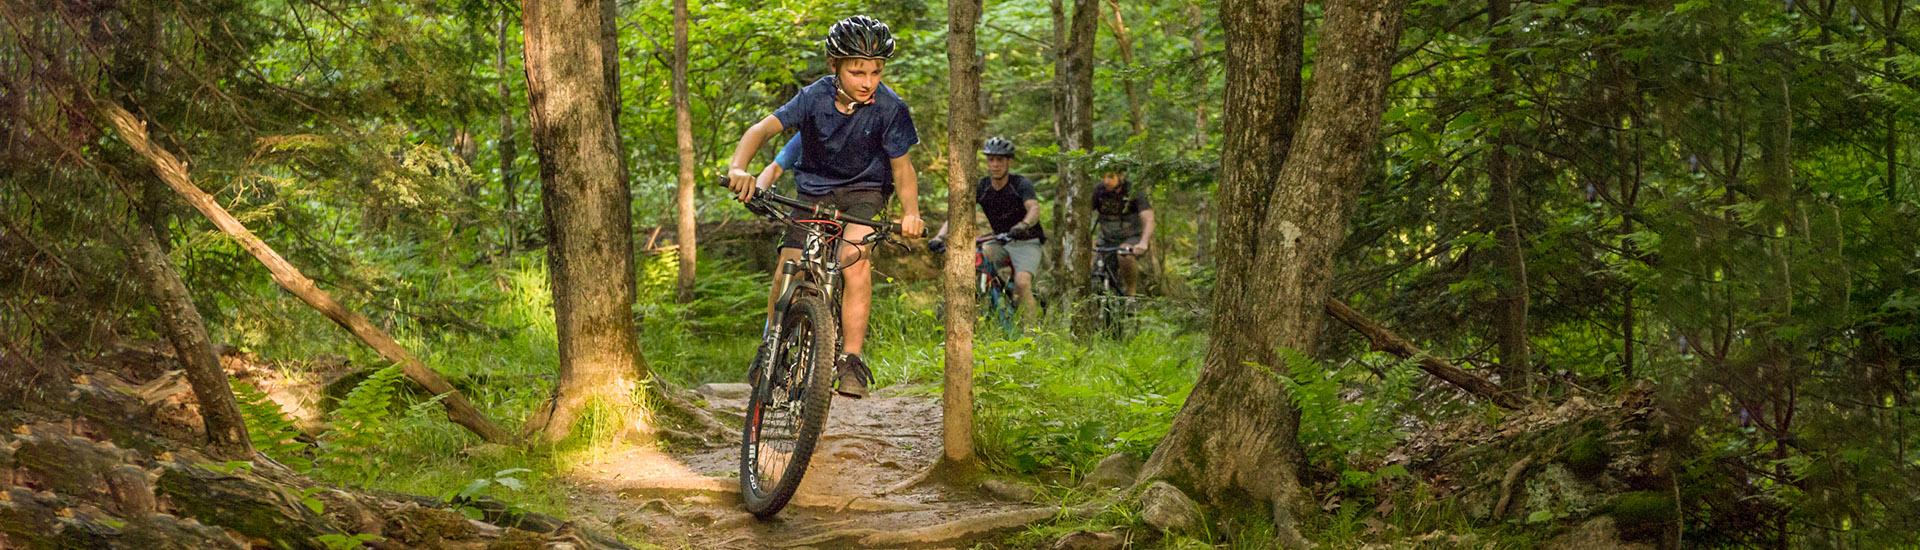 Muskoka Biking Adventure